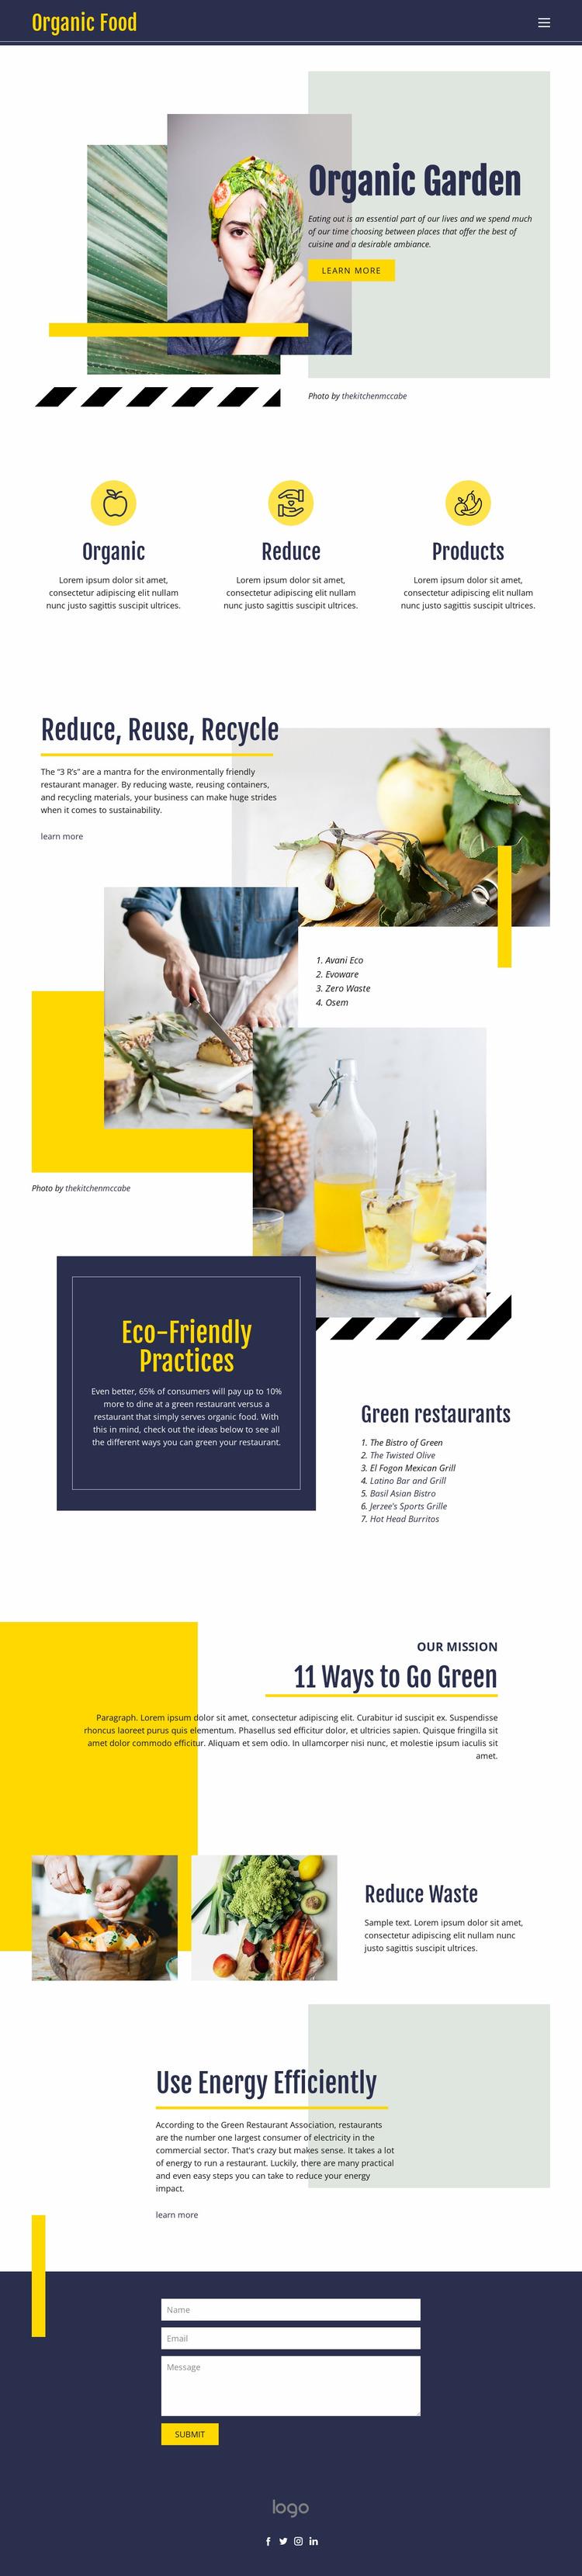 Organic natural food Website Mockup